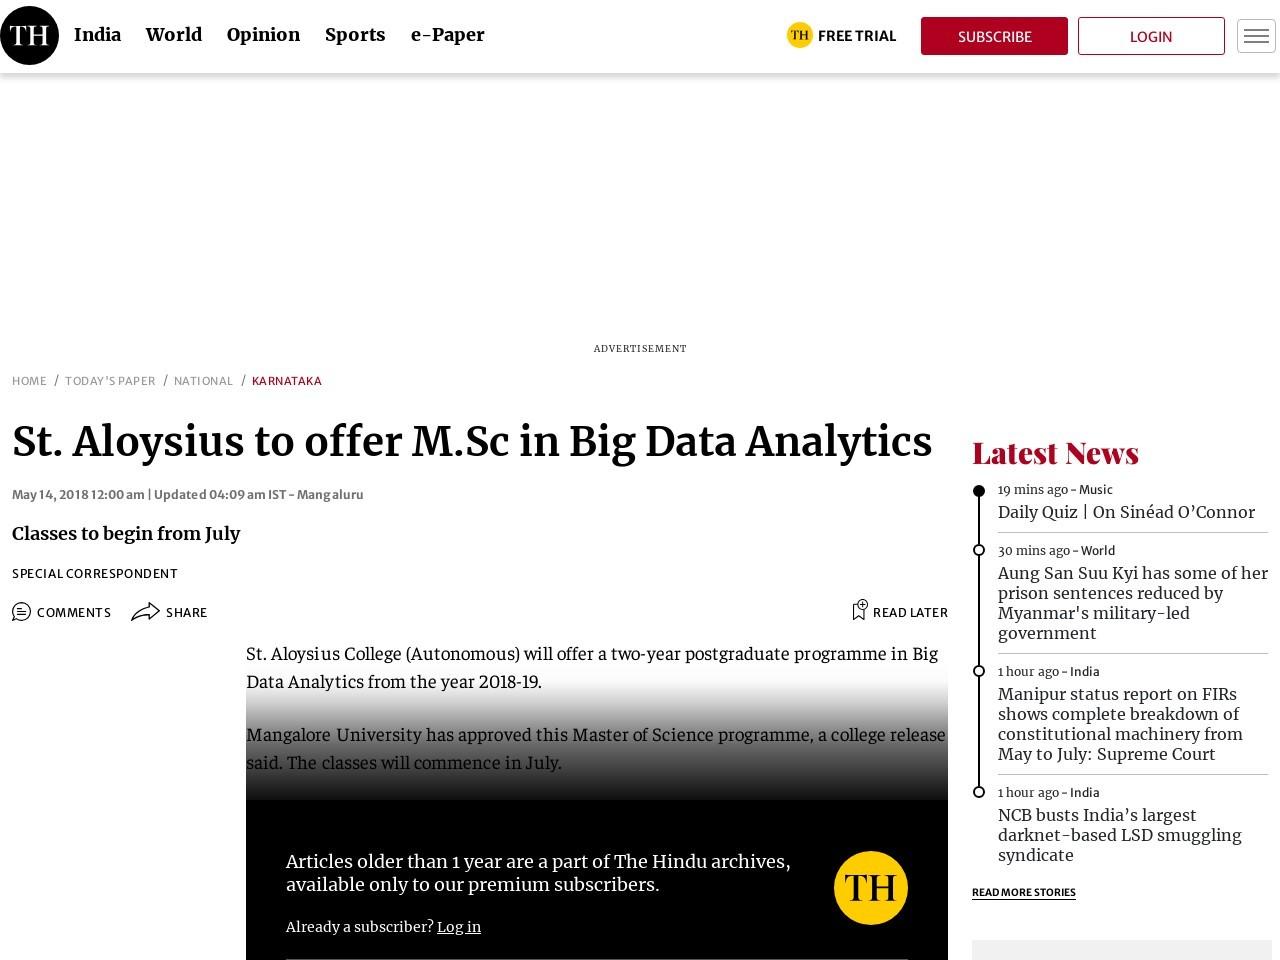 St. Aloysius to offer M.Sc in Big Data Analytics